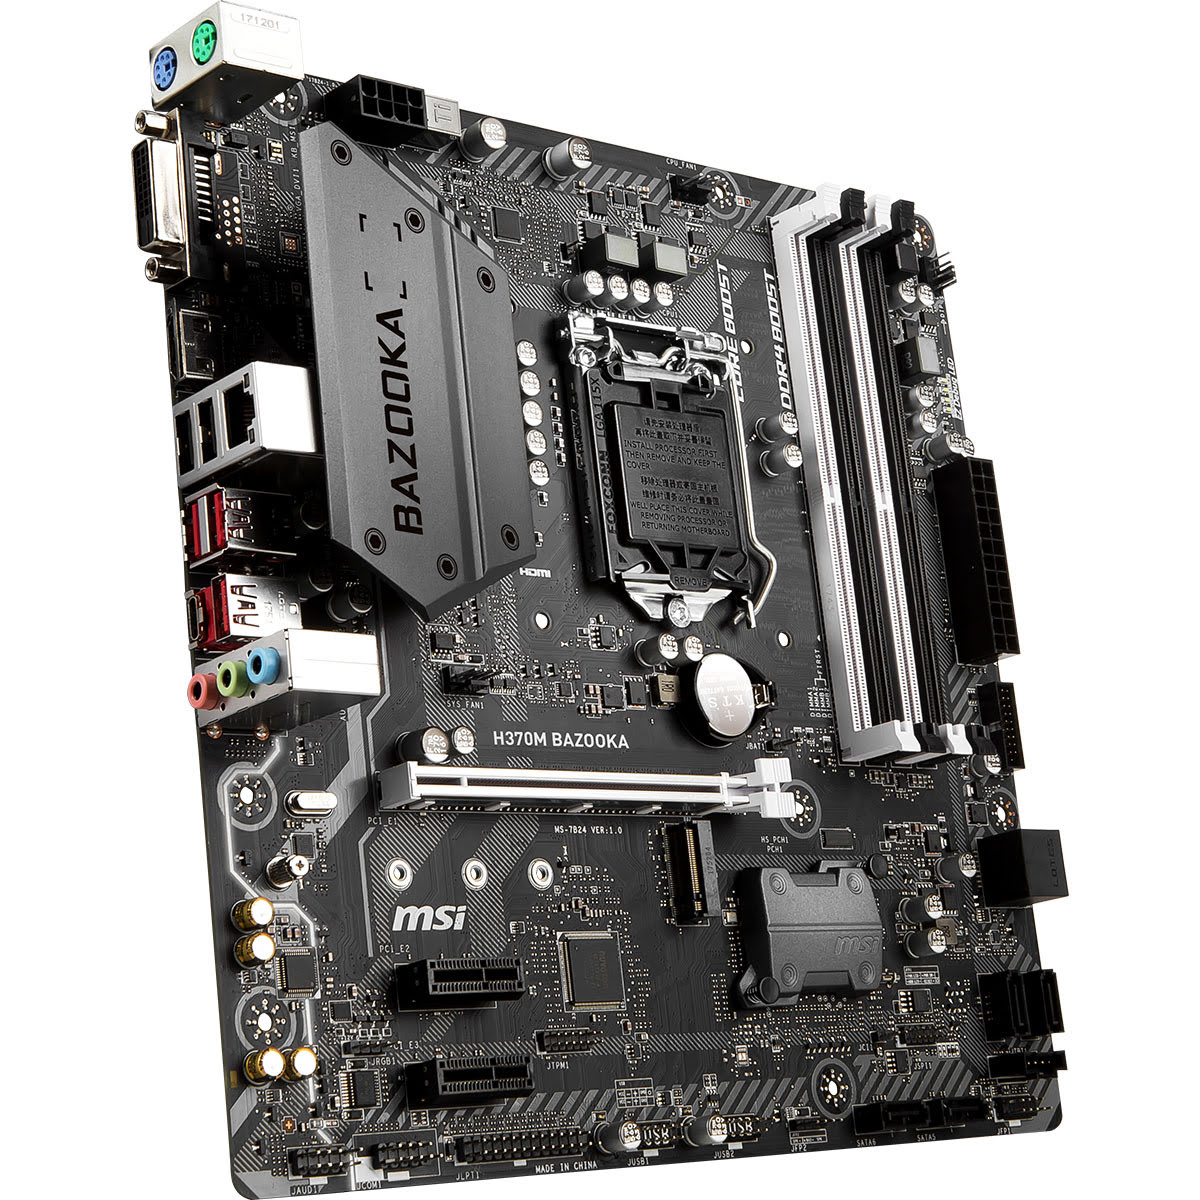 MSI H370M BAZOOKA Micro-ATX DDR4 - Carte mère MSI - Cybertek.fr - 3